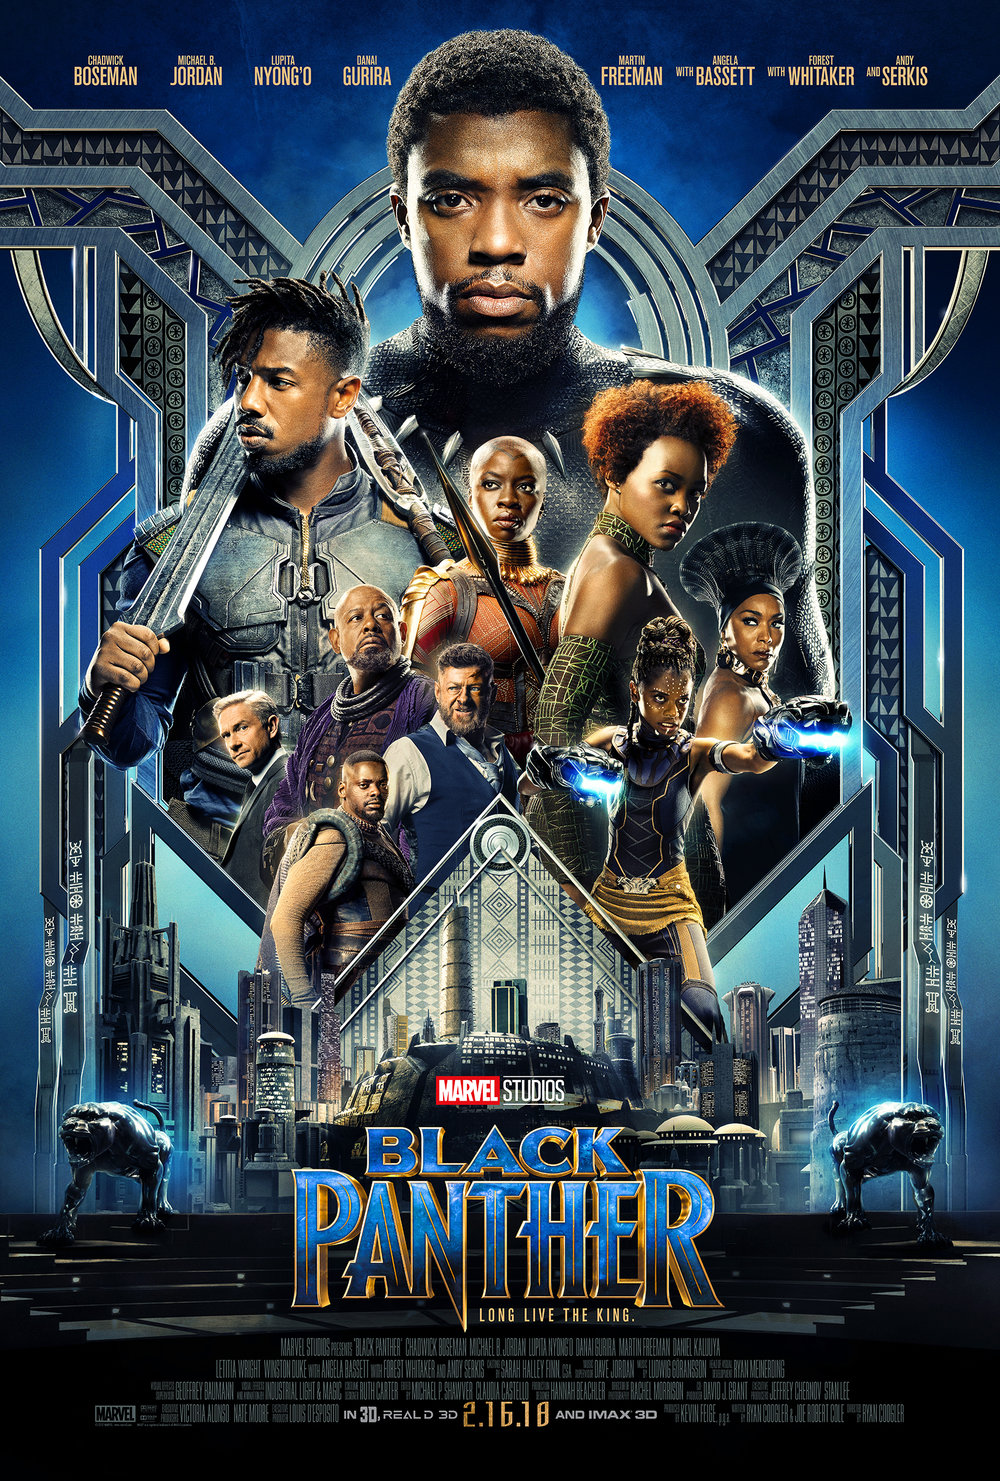 Black_Panther_Poster_October_2017.jpg